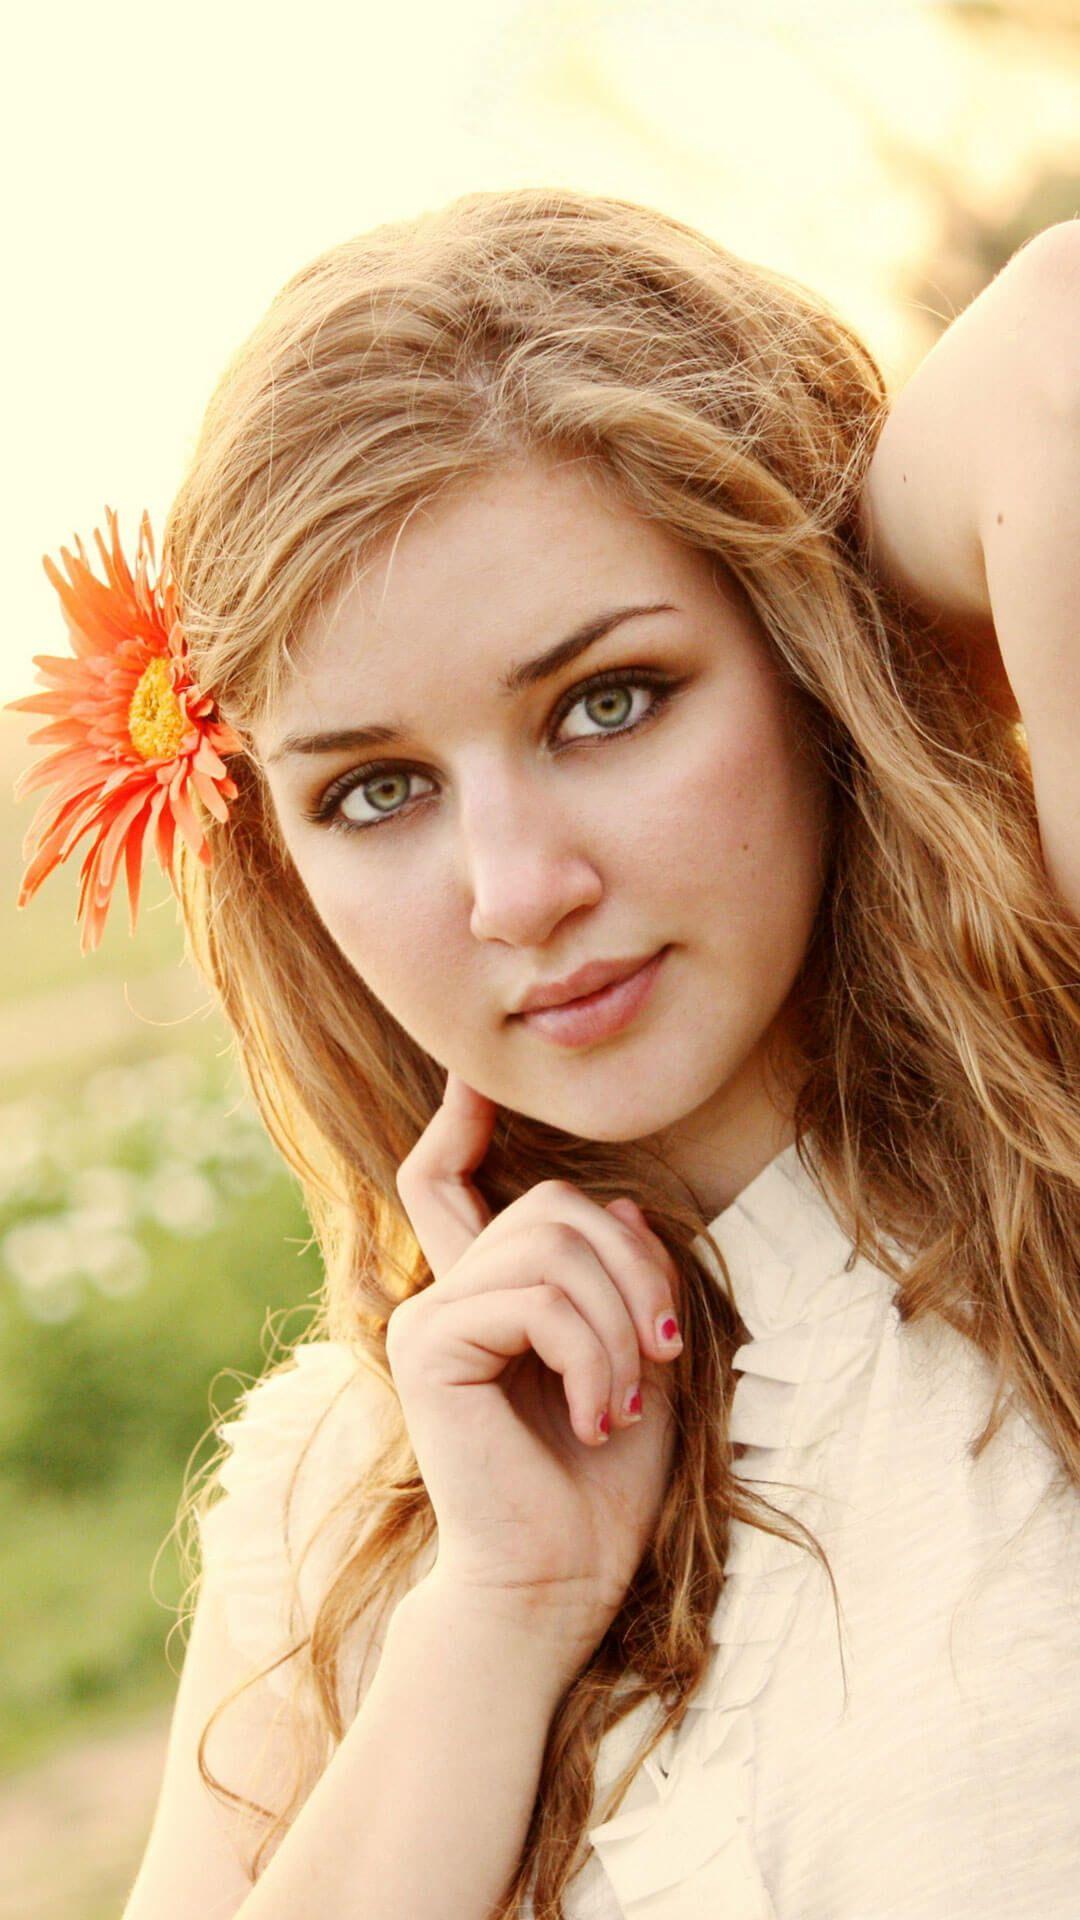 very beautiful girls in the world wallpaper iphone hd | cute girl